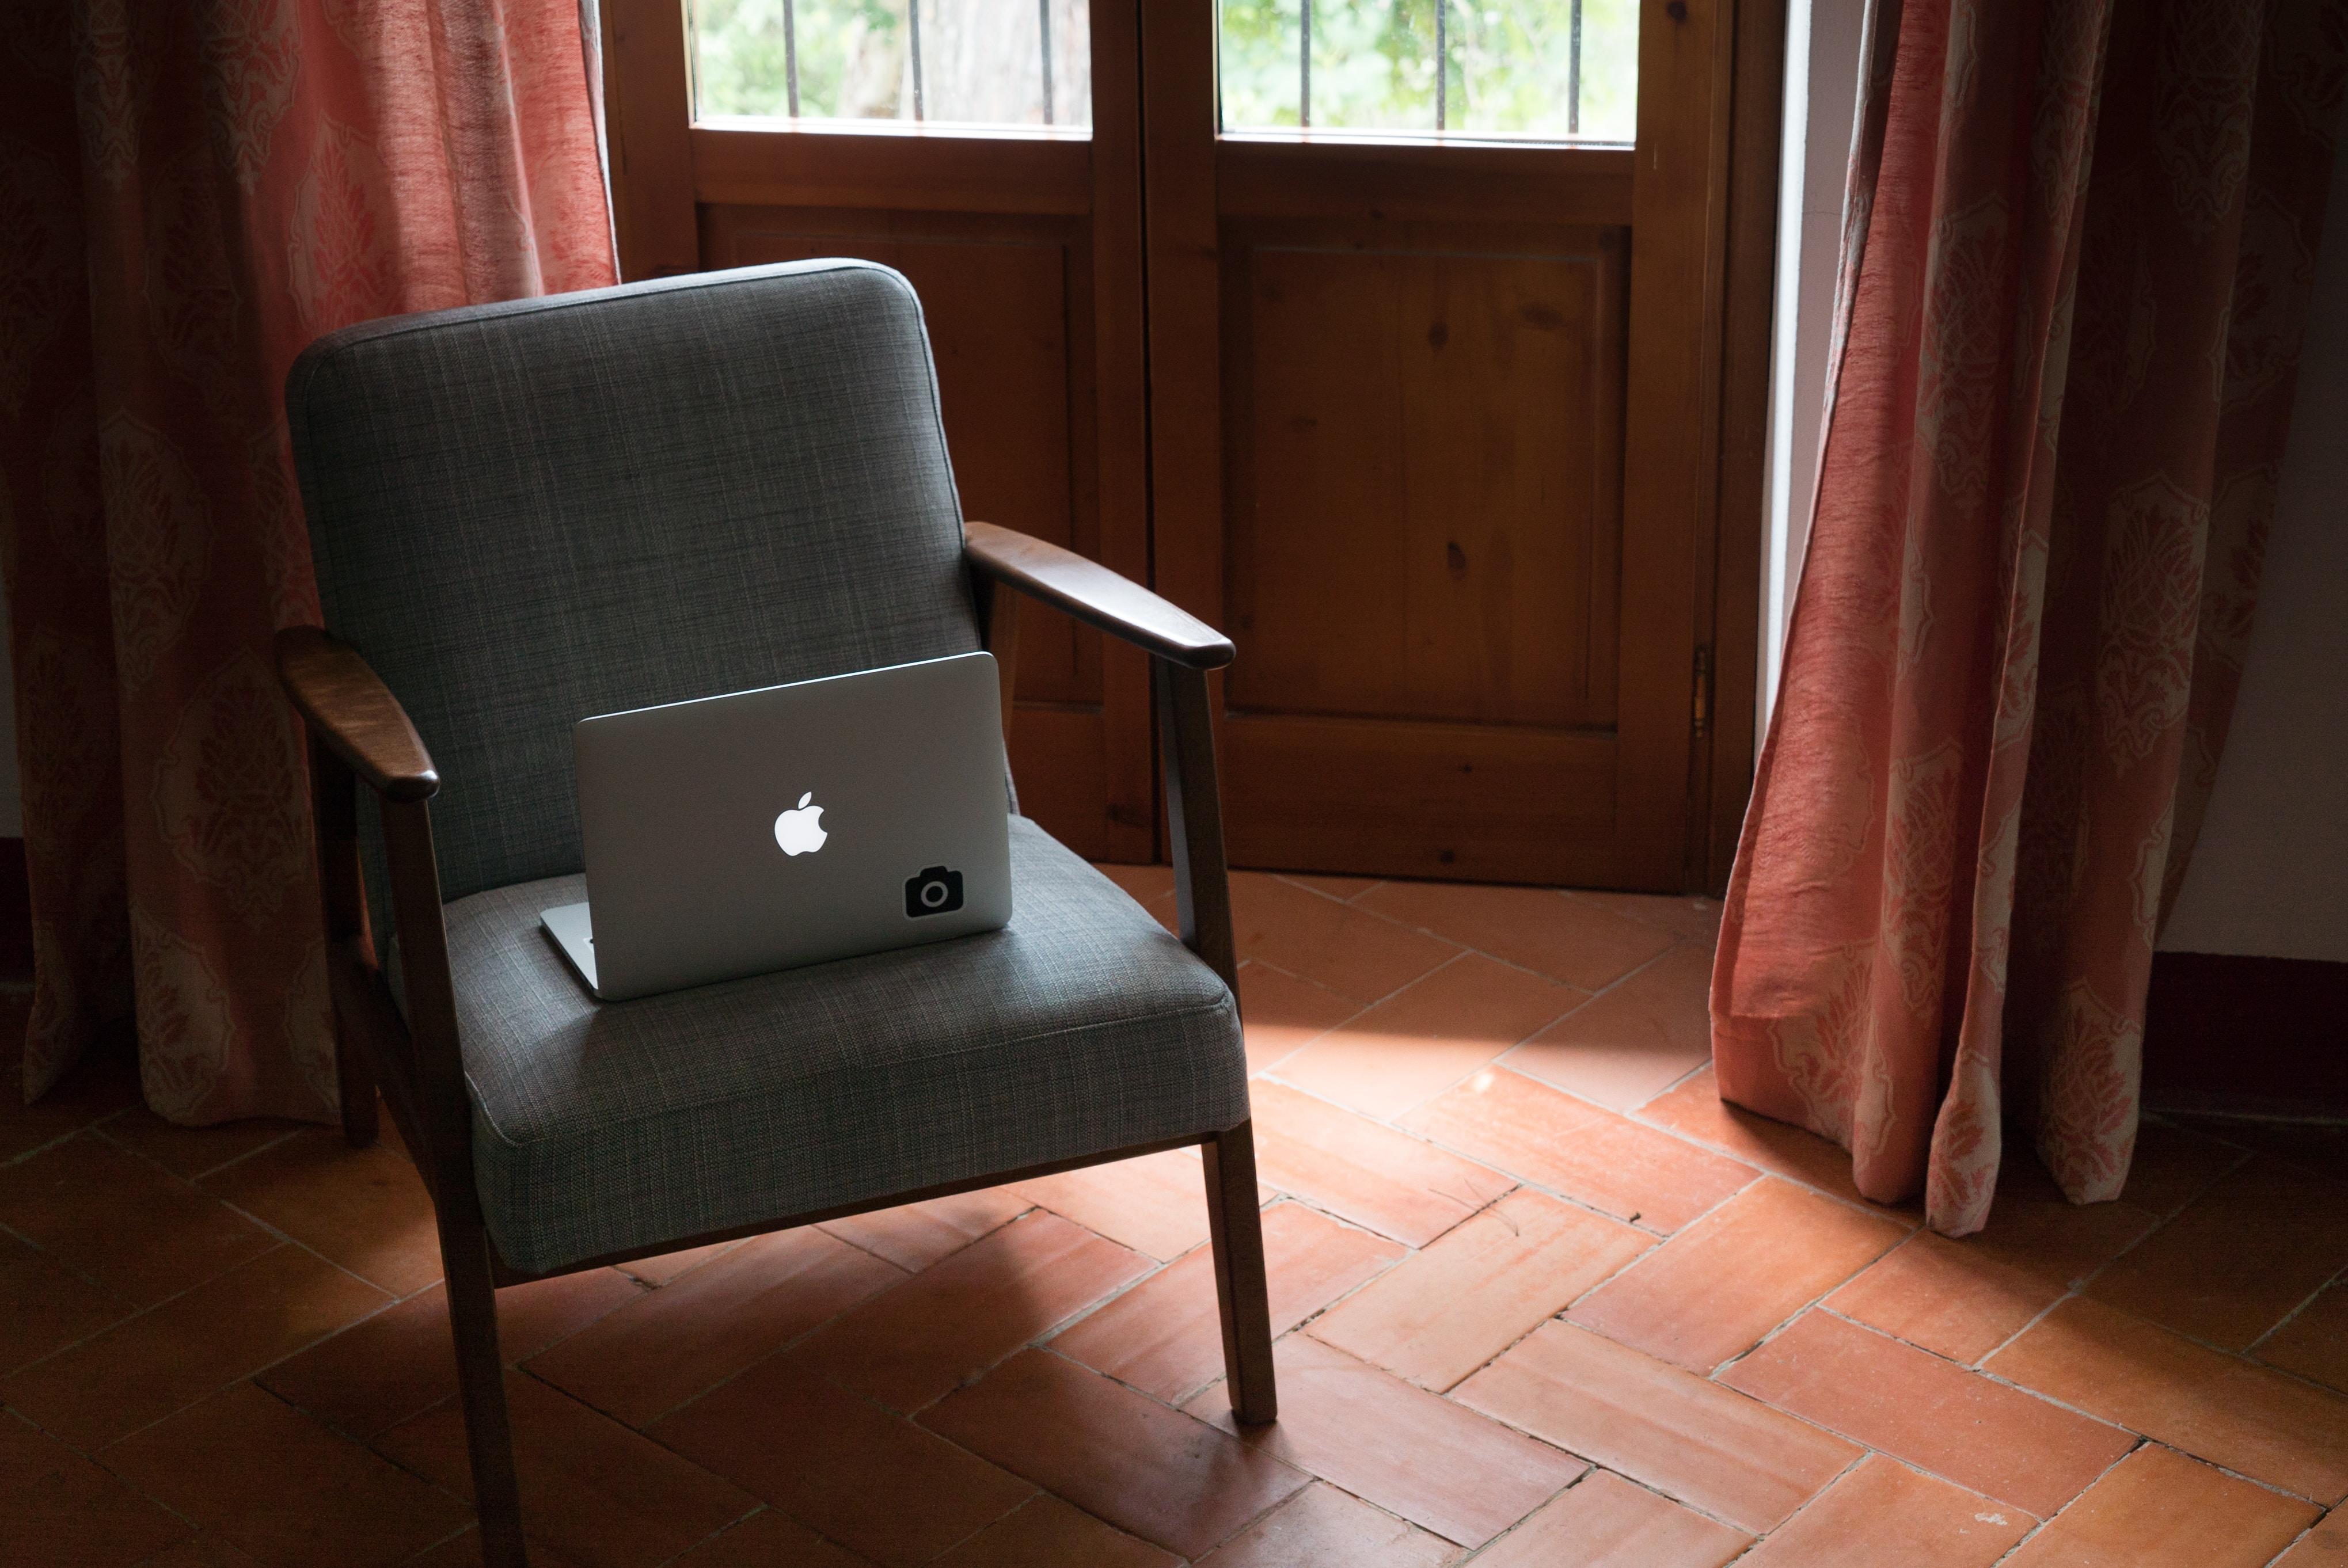 silver MacBook on gray armchair